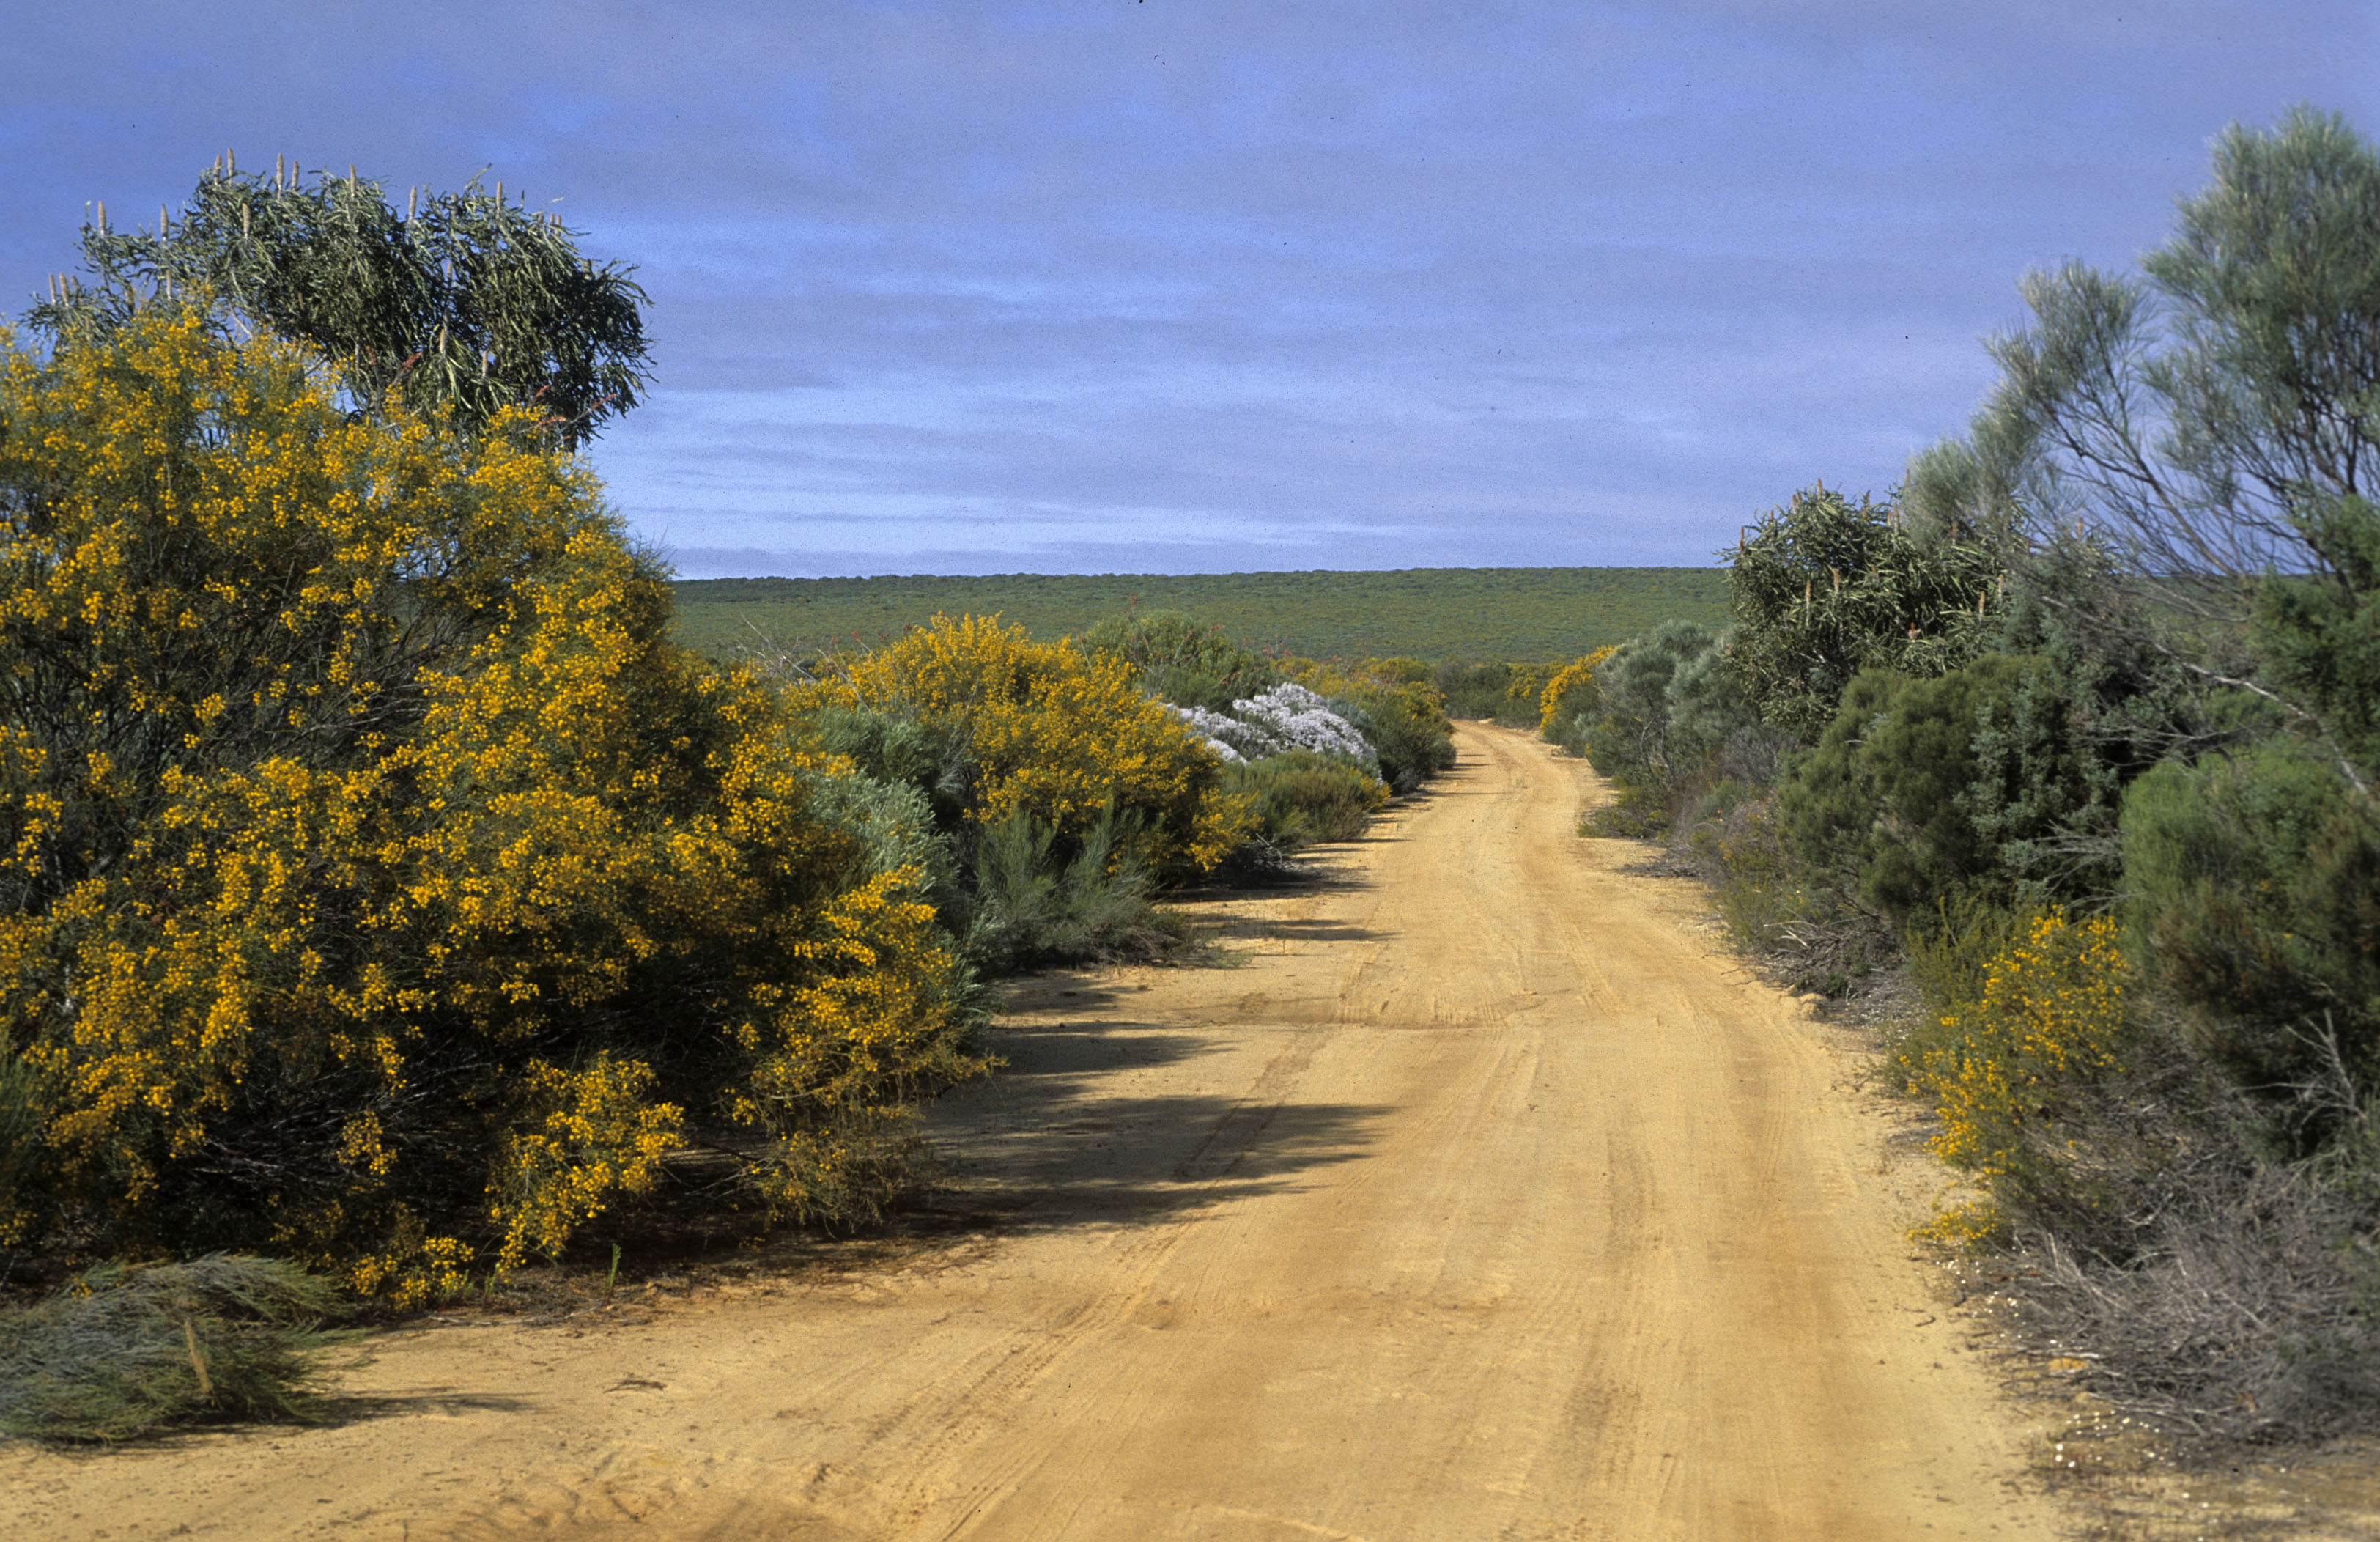 Acacia scirpifolia